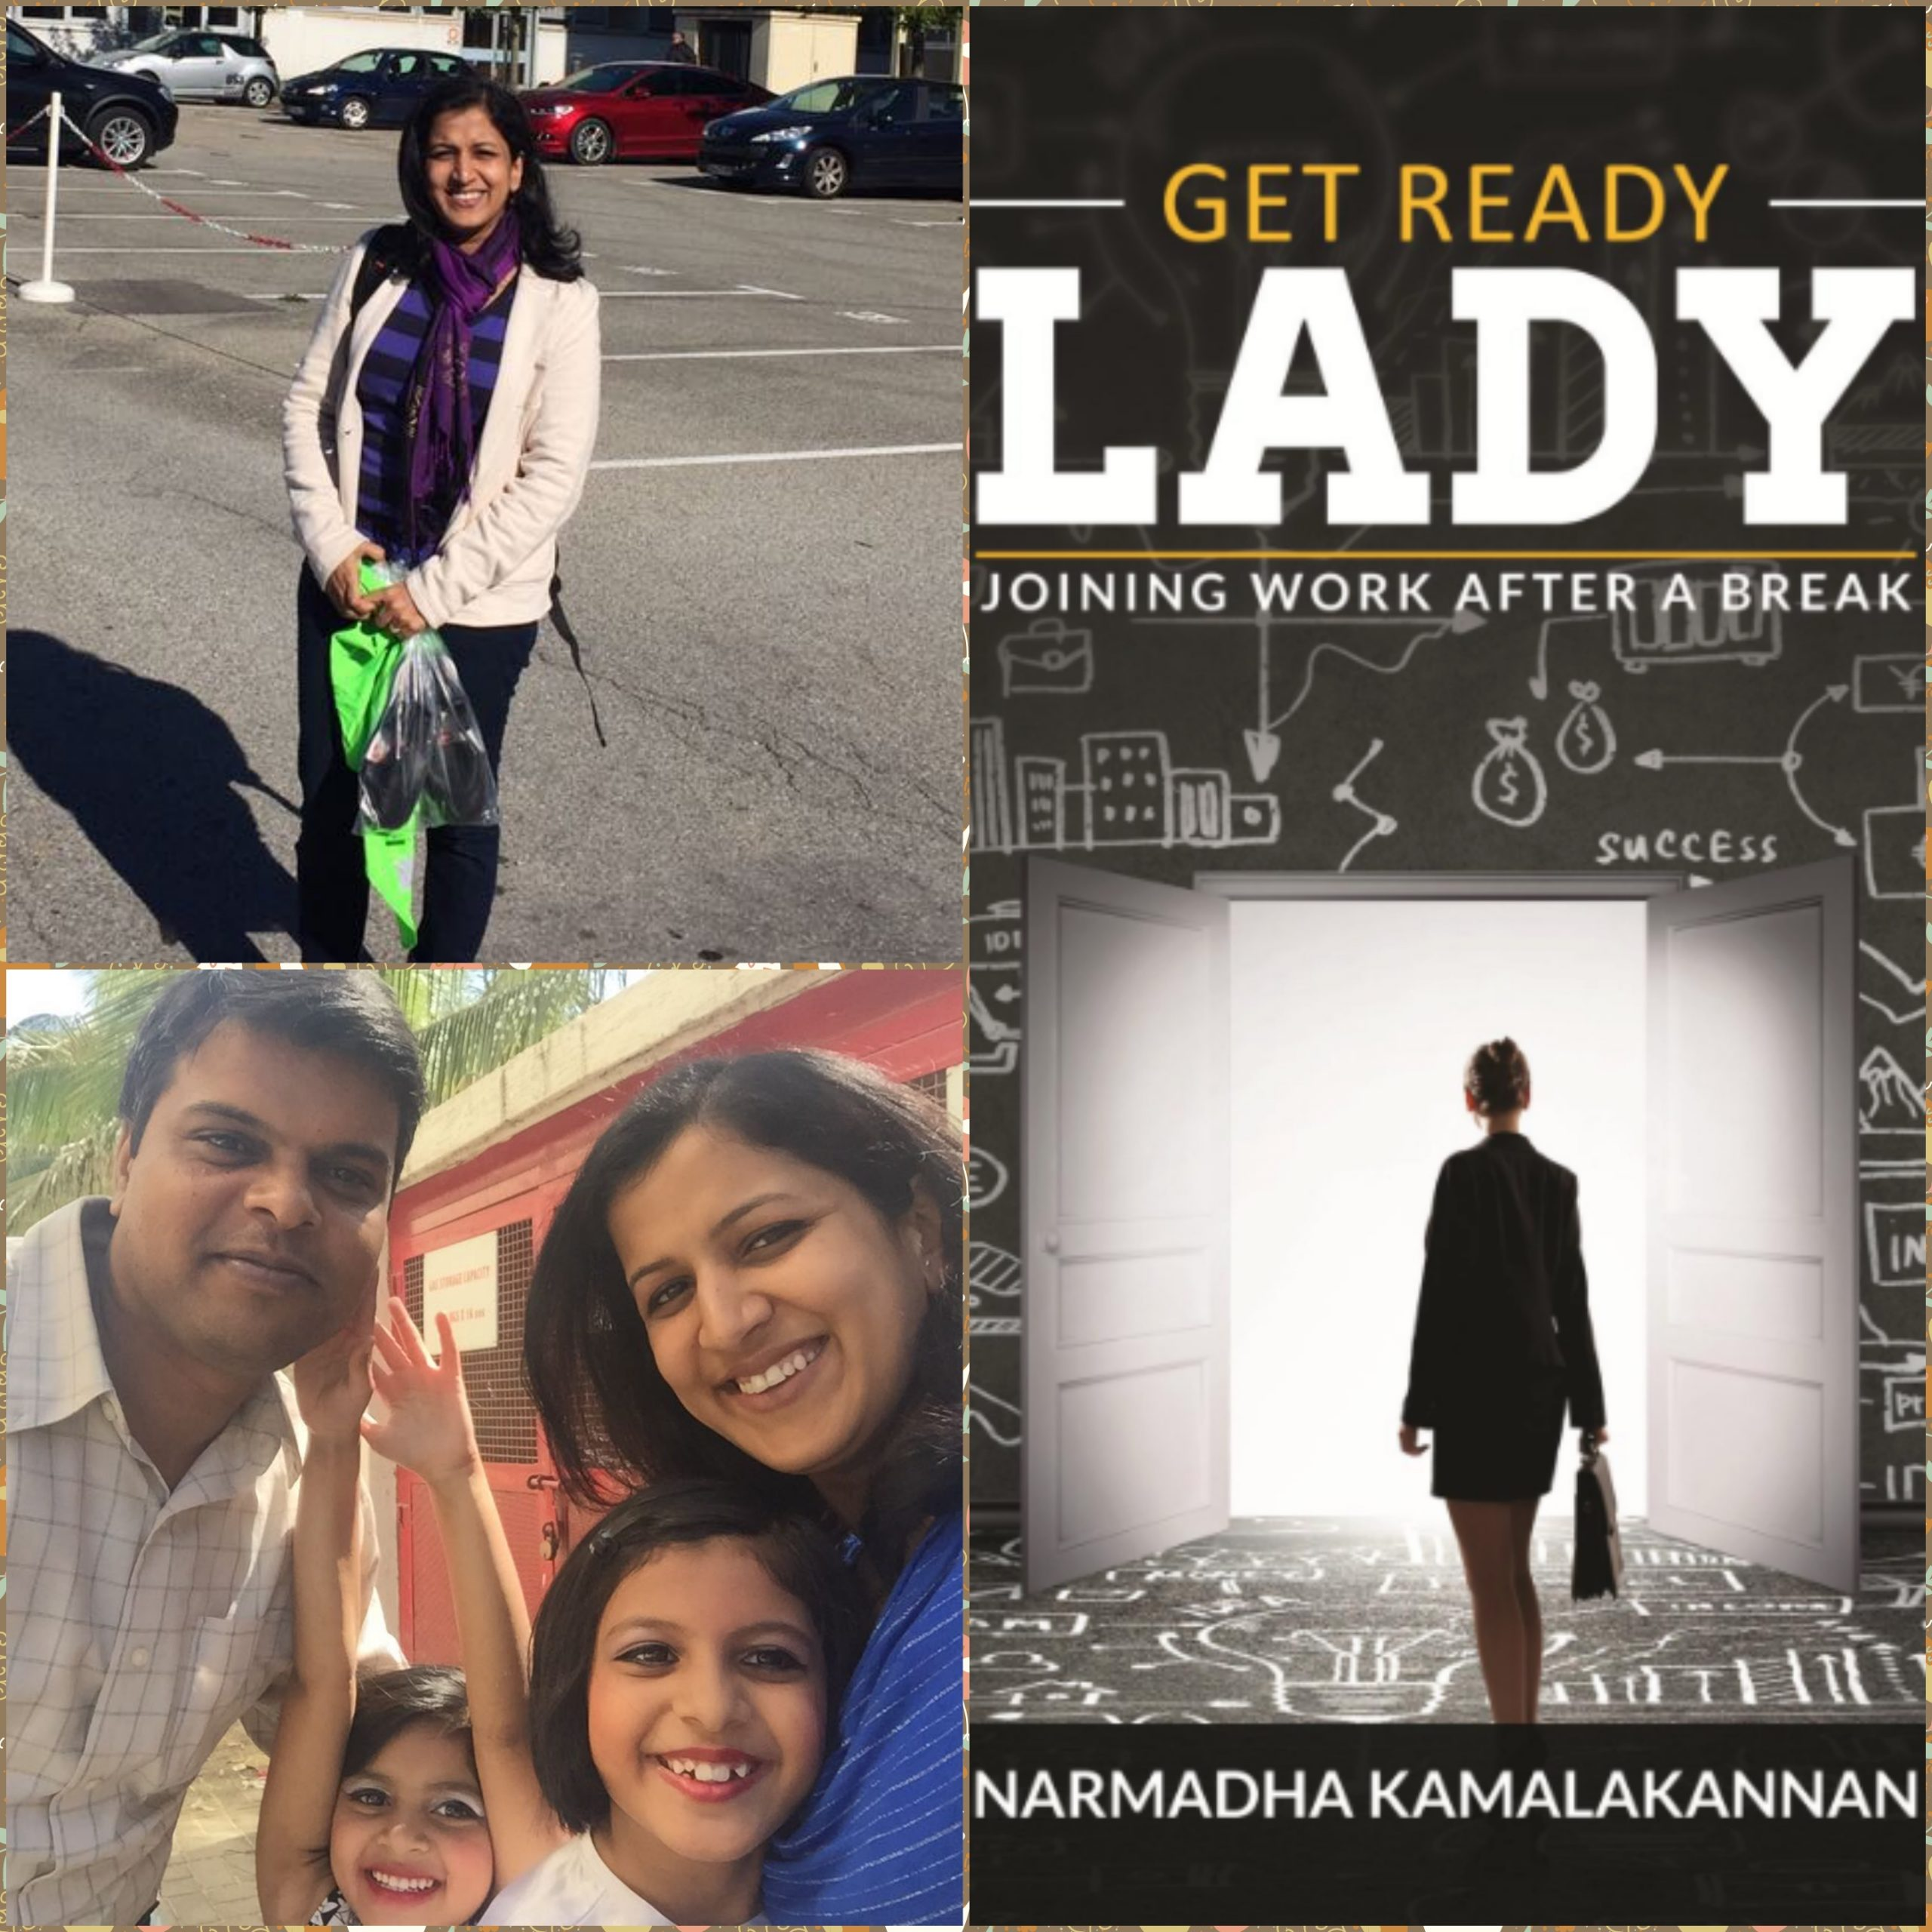 GET READY LADY Interview Series : Deepan talks about Manju, Senior SAP Engineer